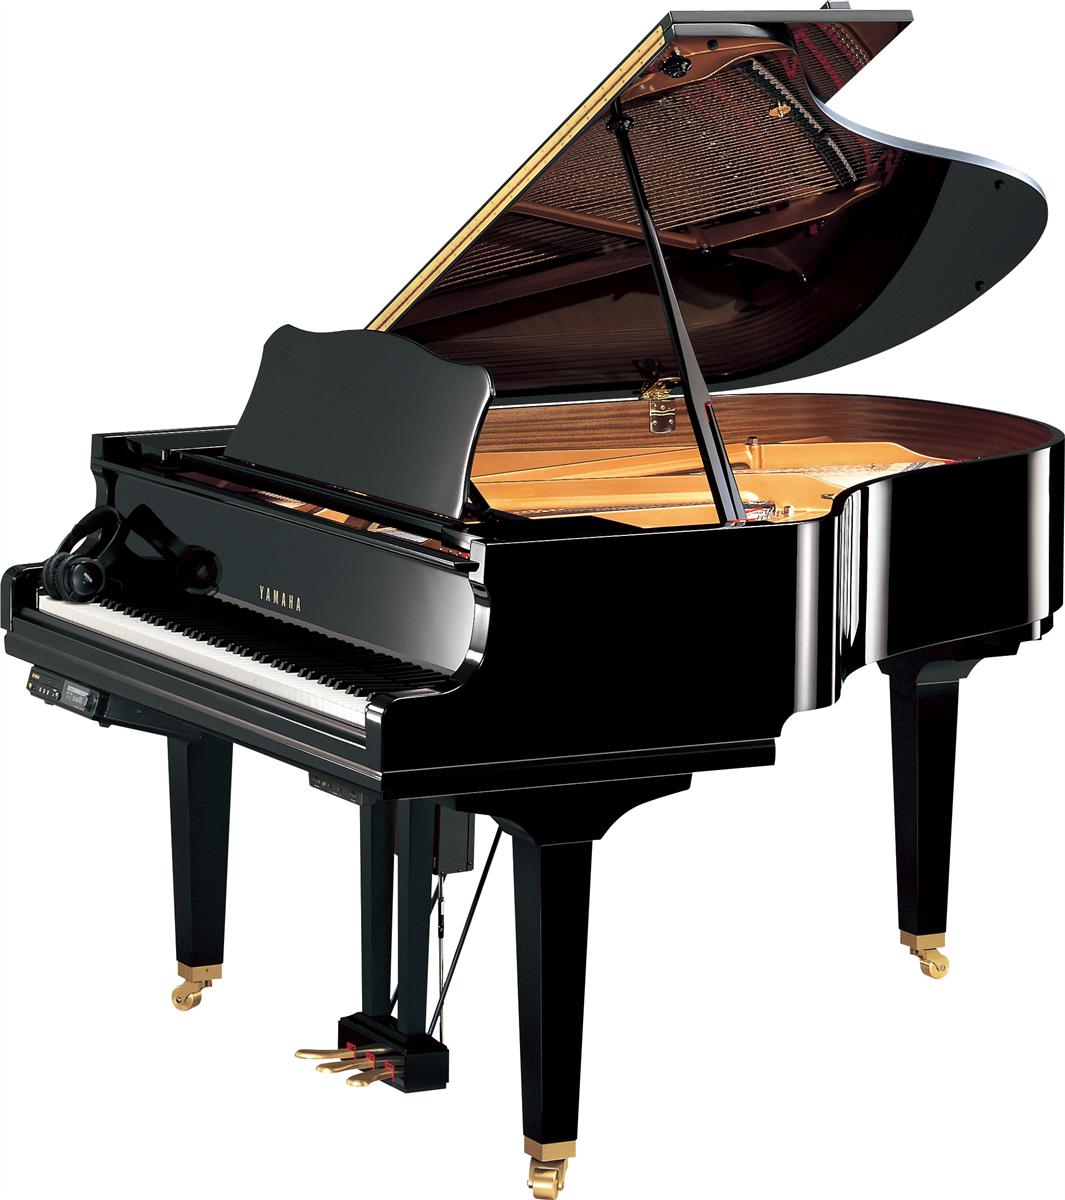 Yamaha DGC2 ENSPIRE Disklavier™ Grand Piano